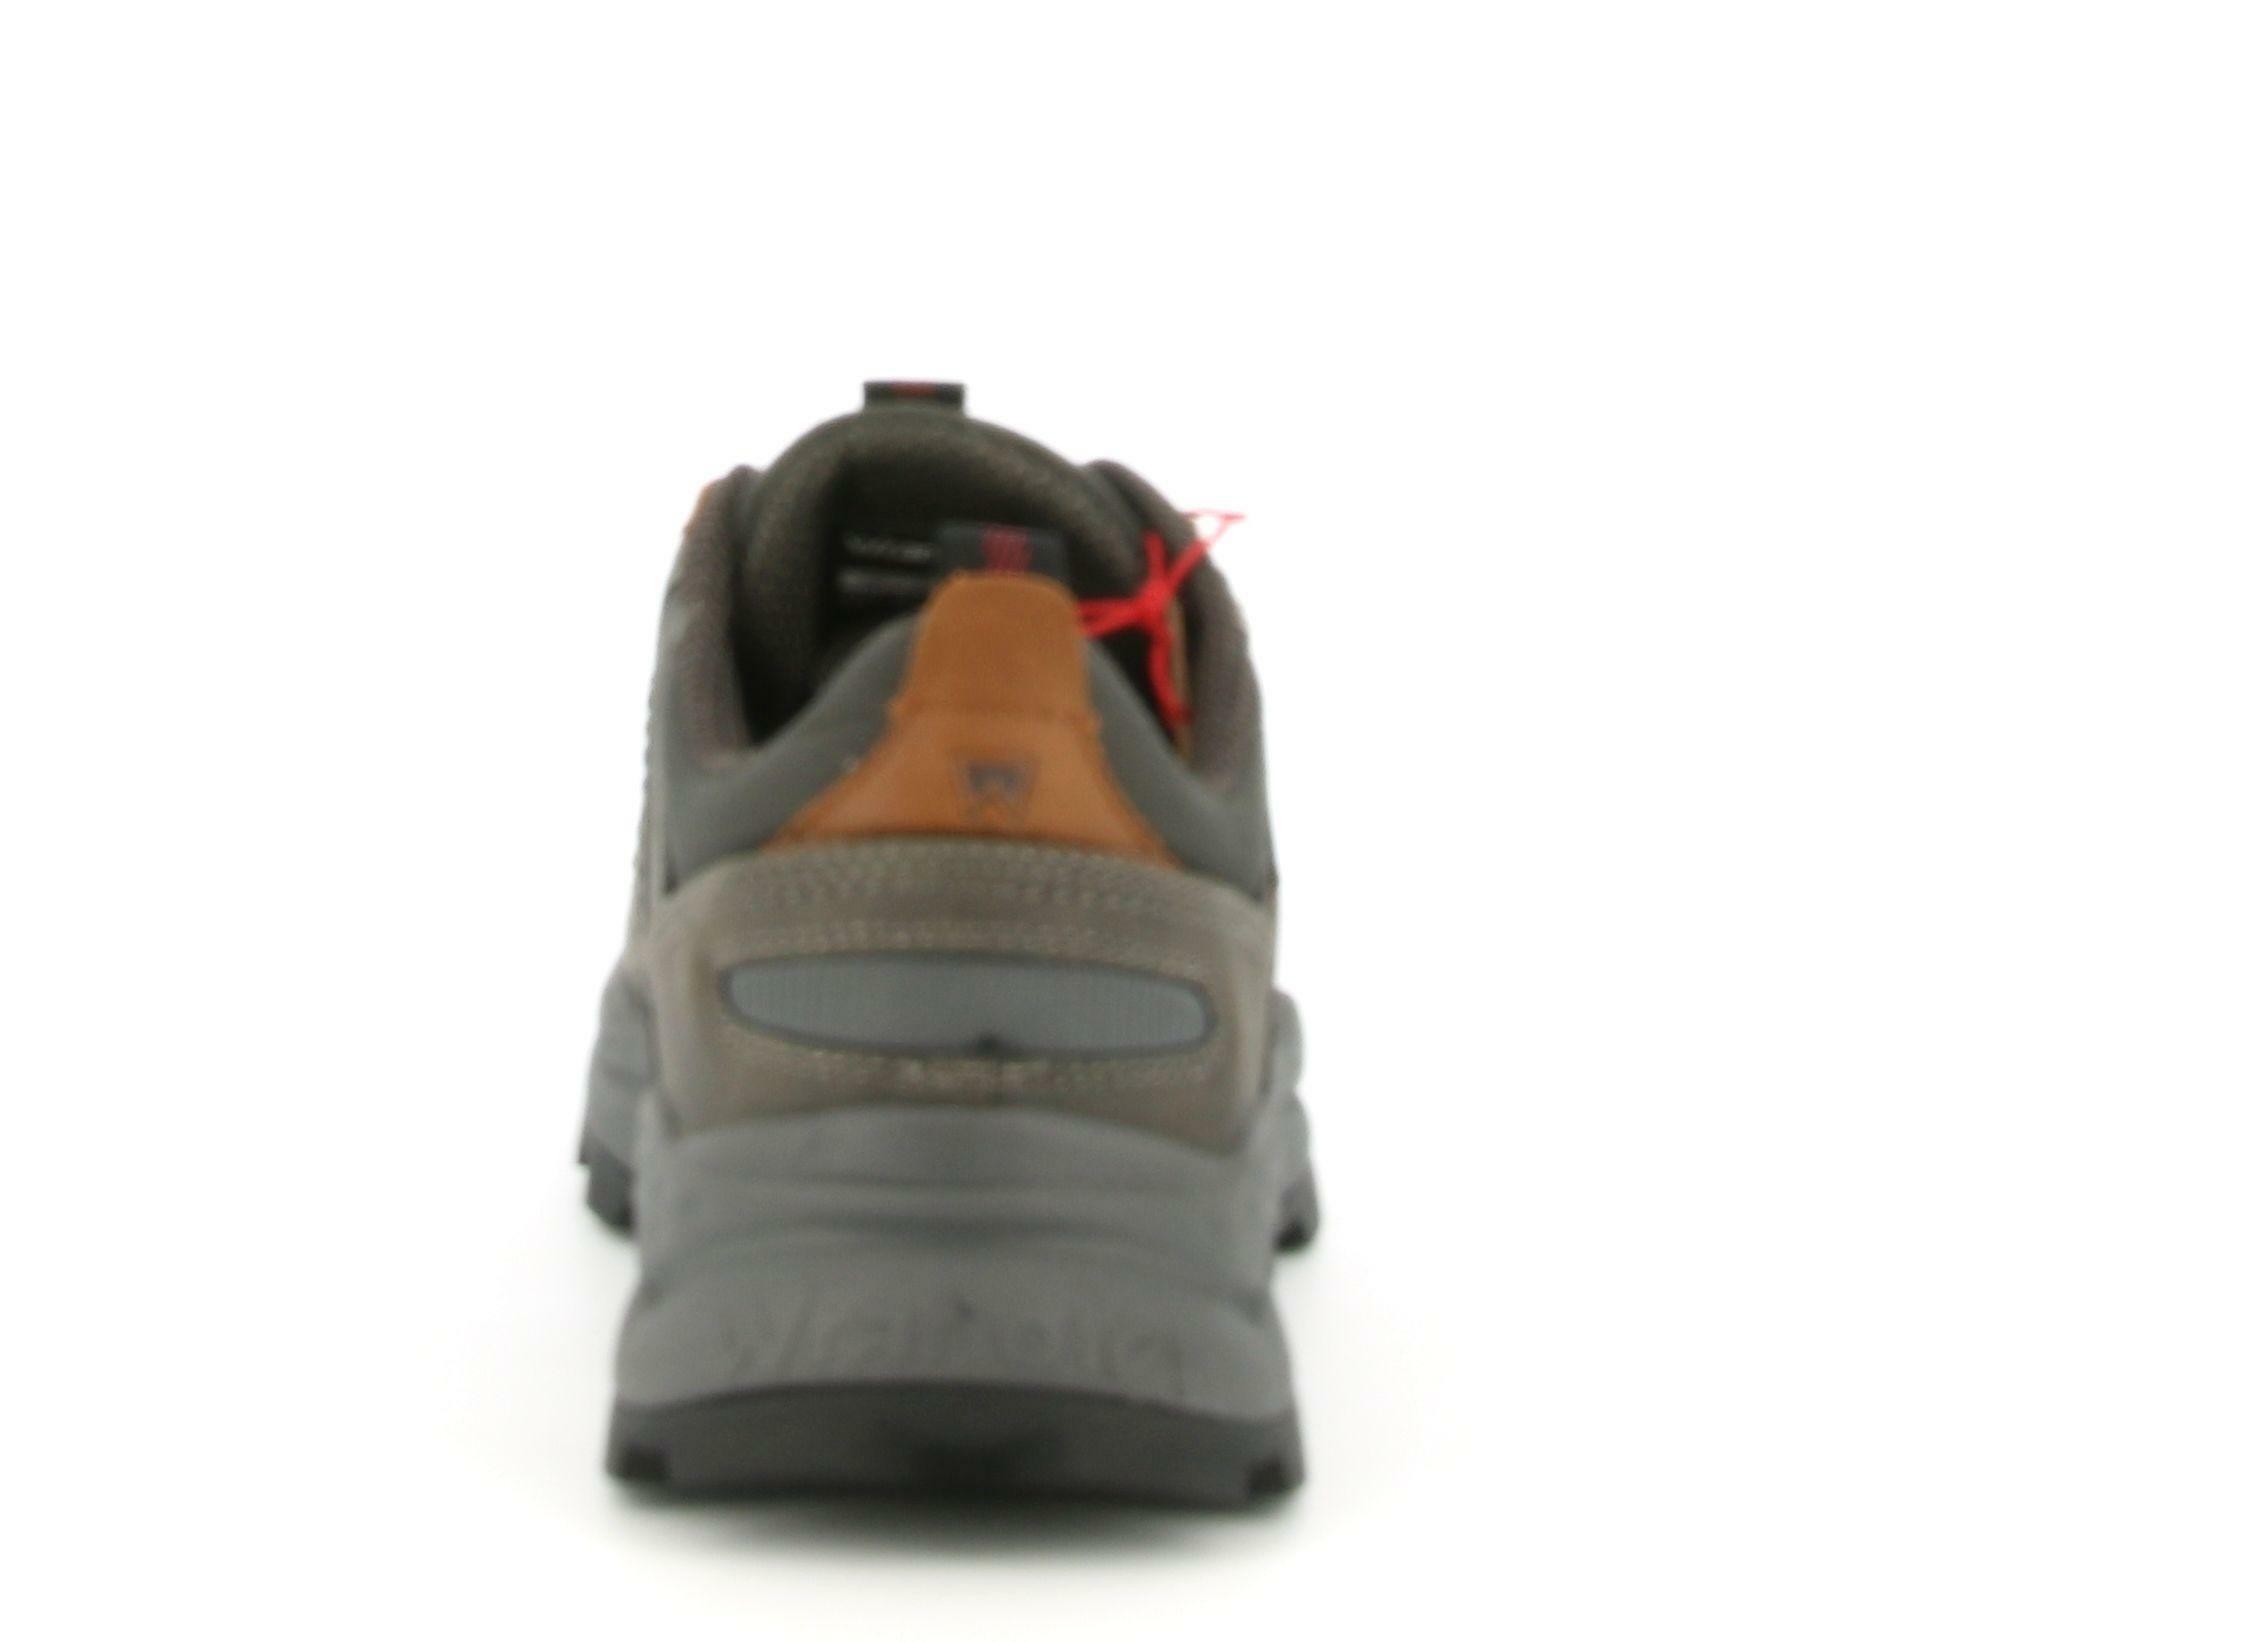 wrangler wrangler allacciato sportivo crossy city wm02151a grigio scarpe da uomo